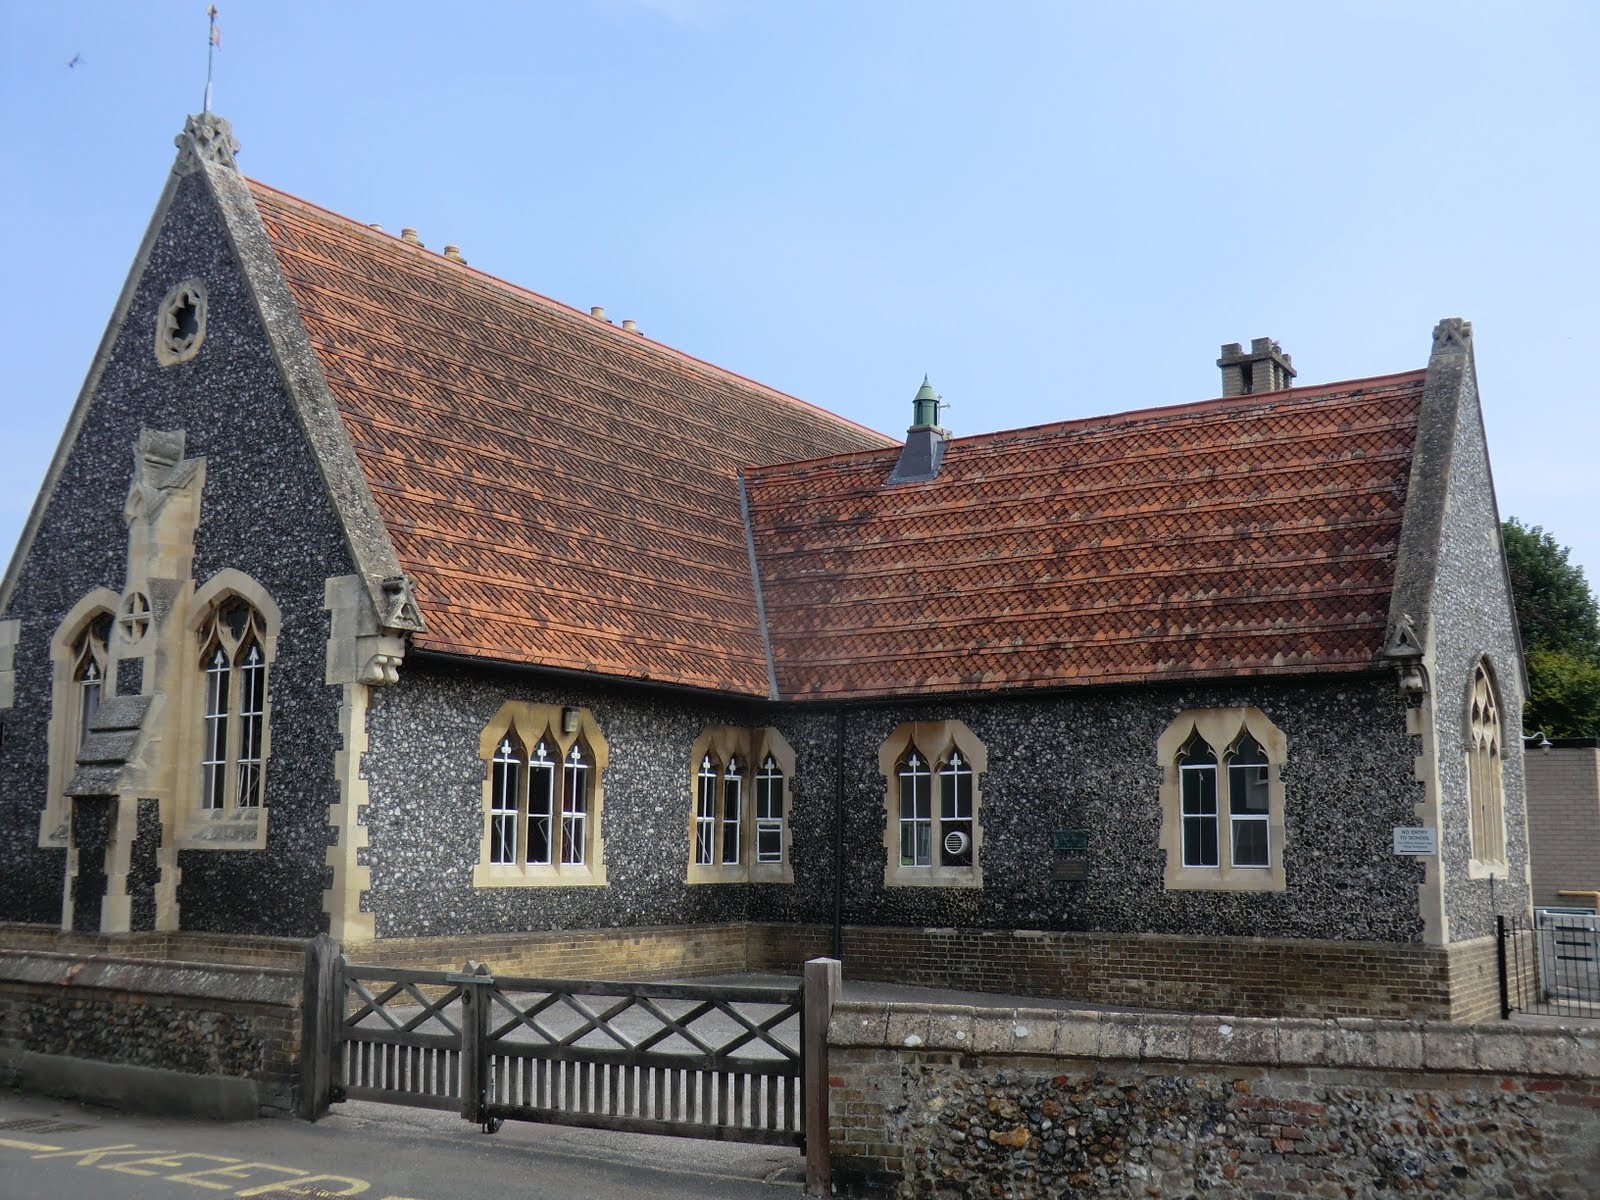 CIMG5984 Village school, Great Chesterford